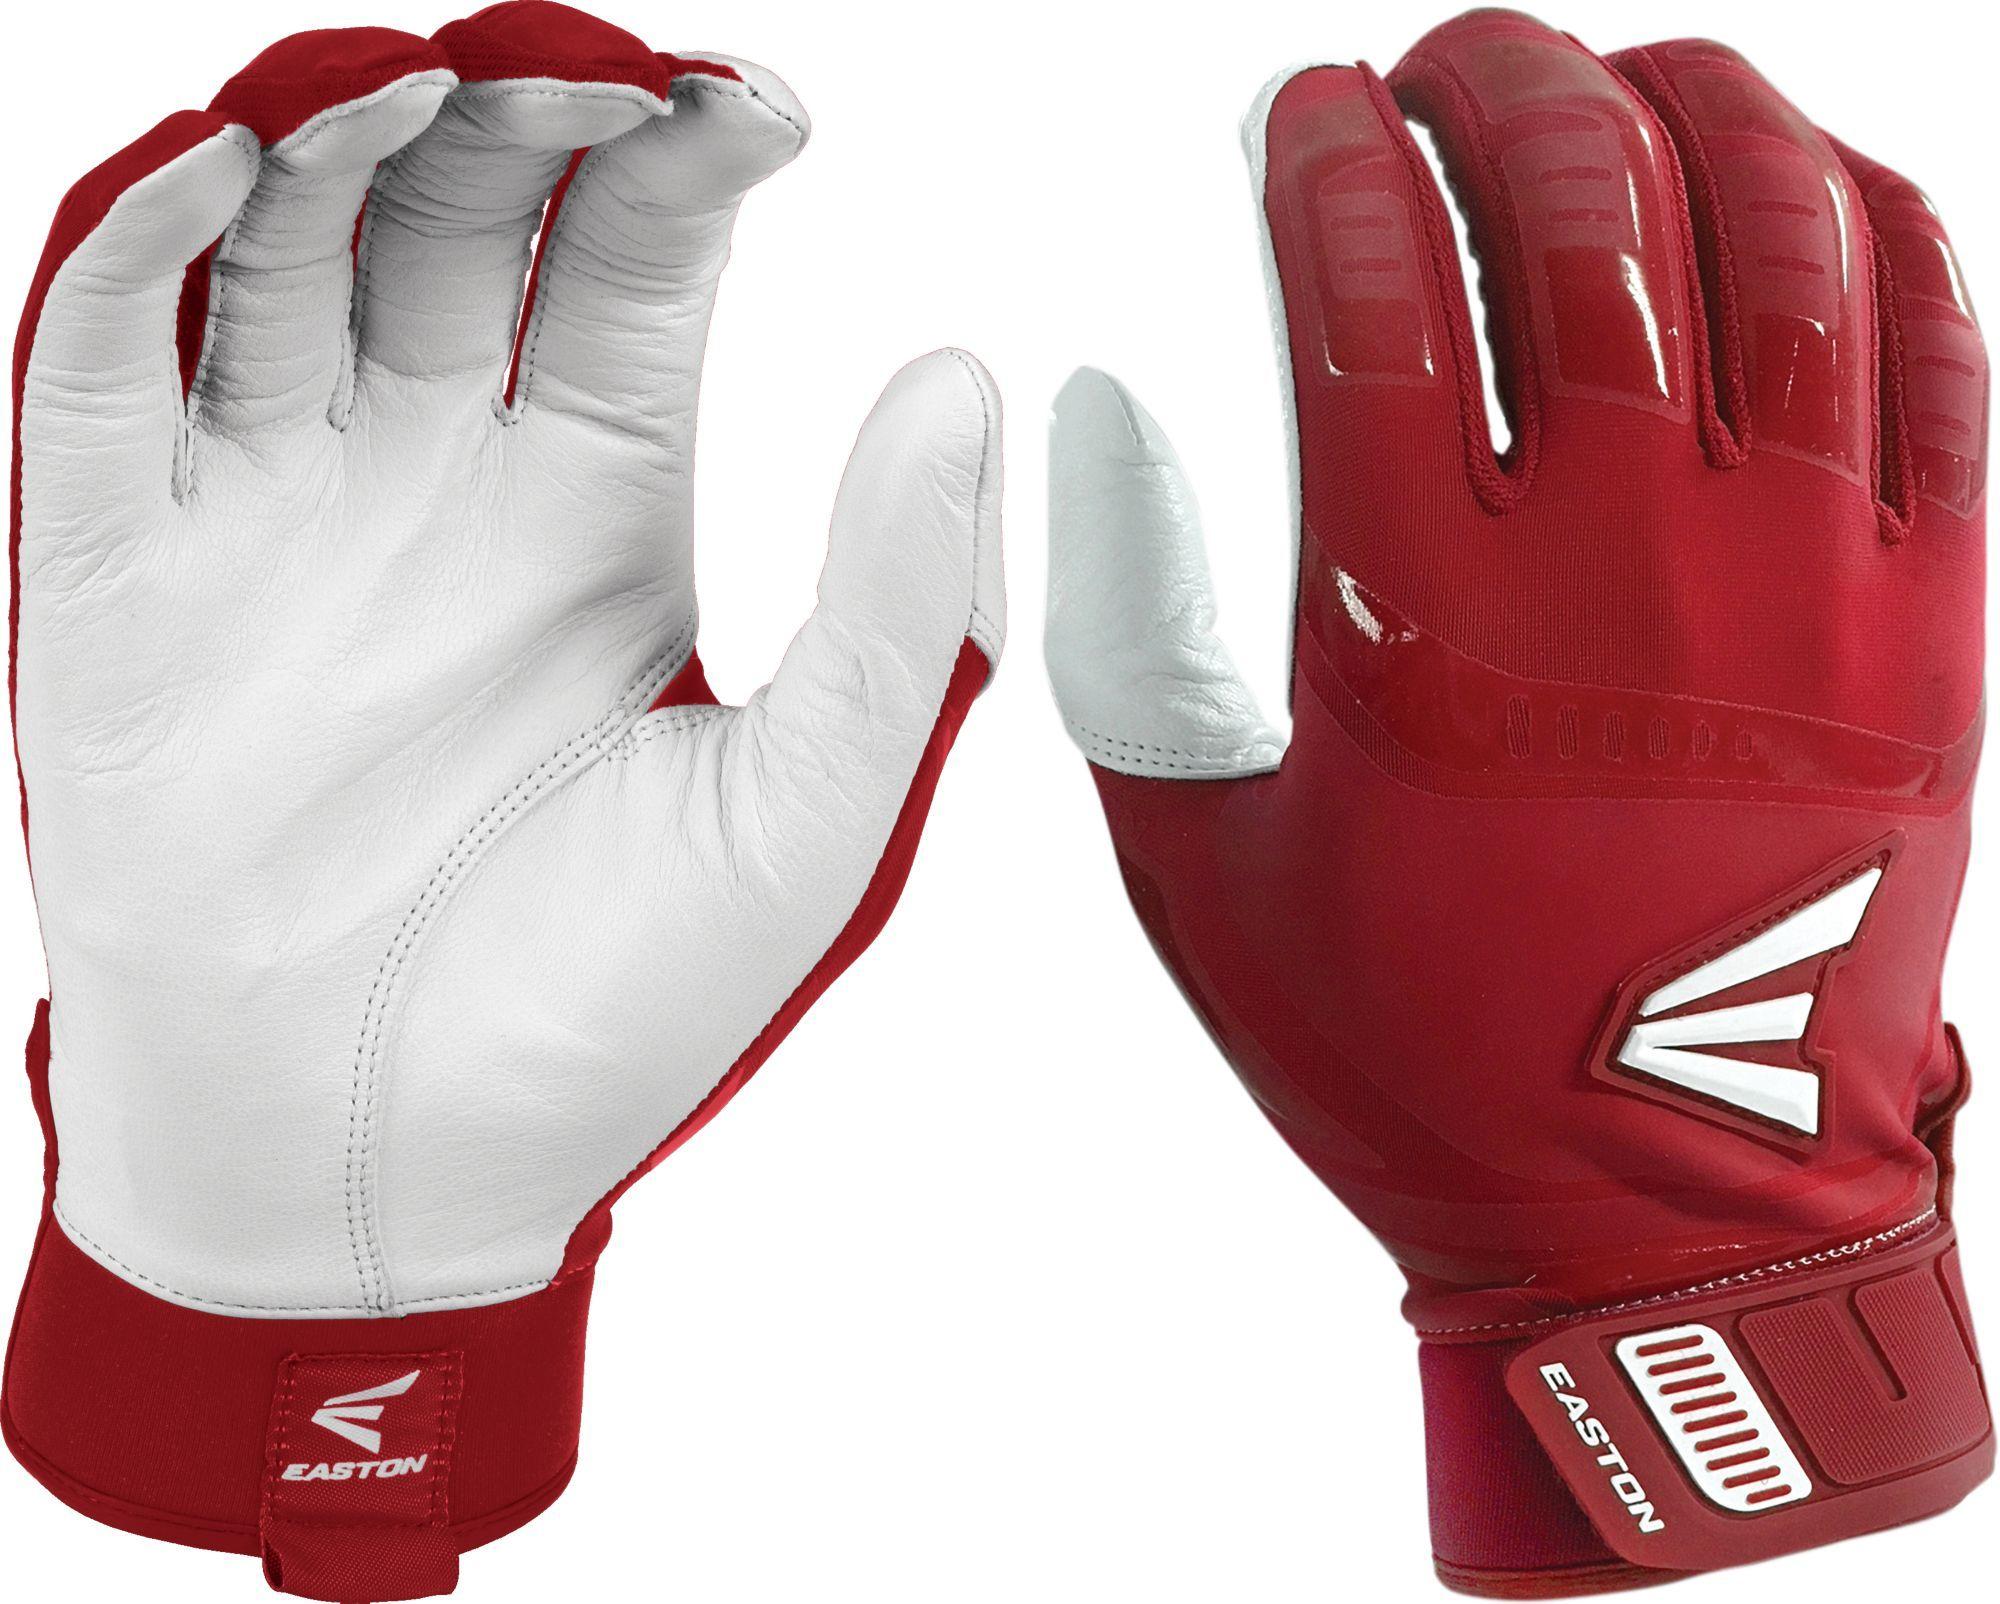 Easton youth walkoff batting gloves 2019 batting gloves